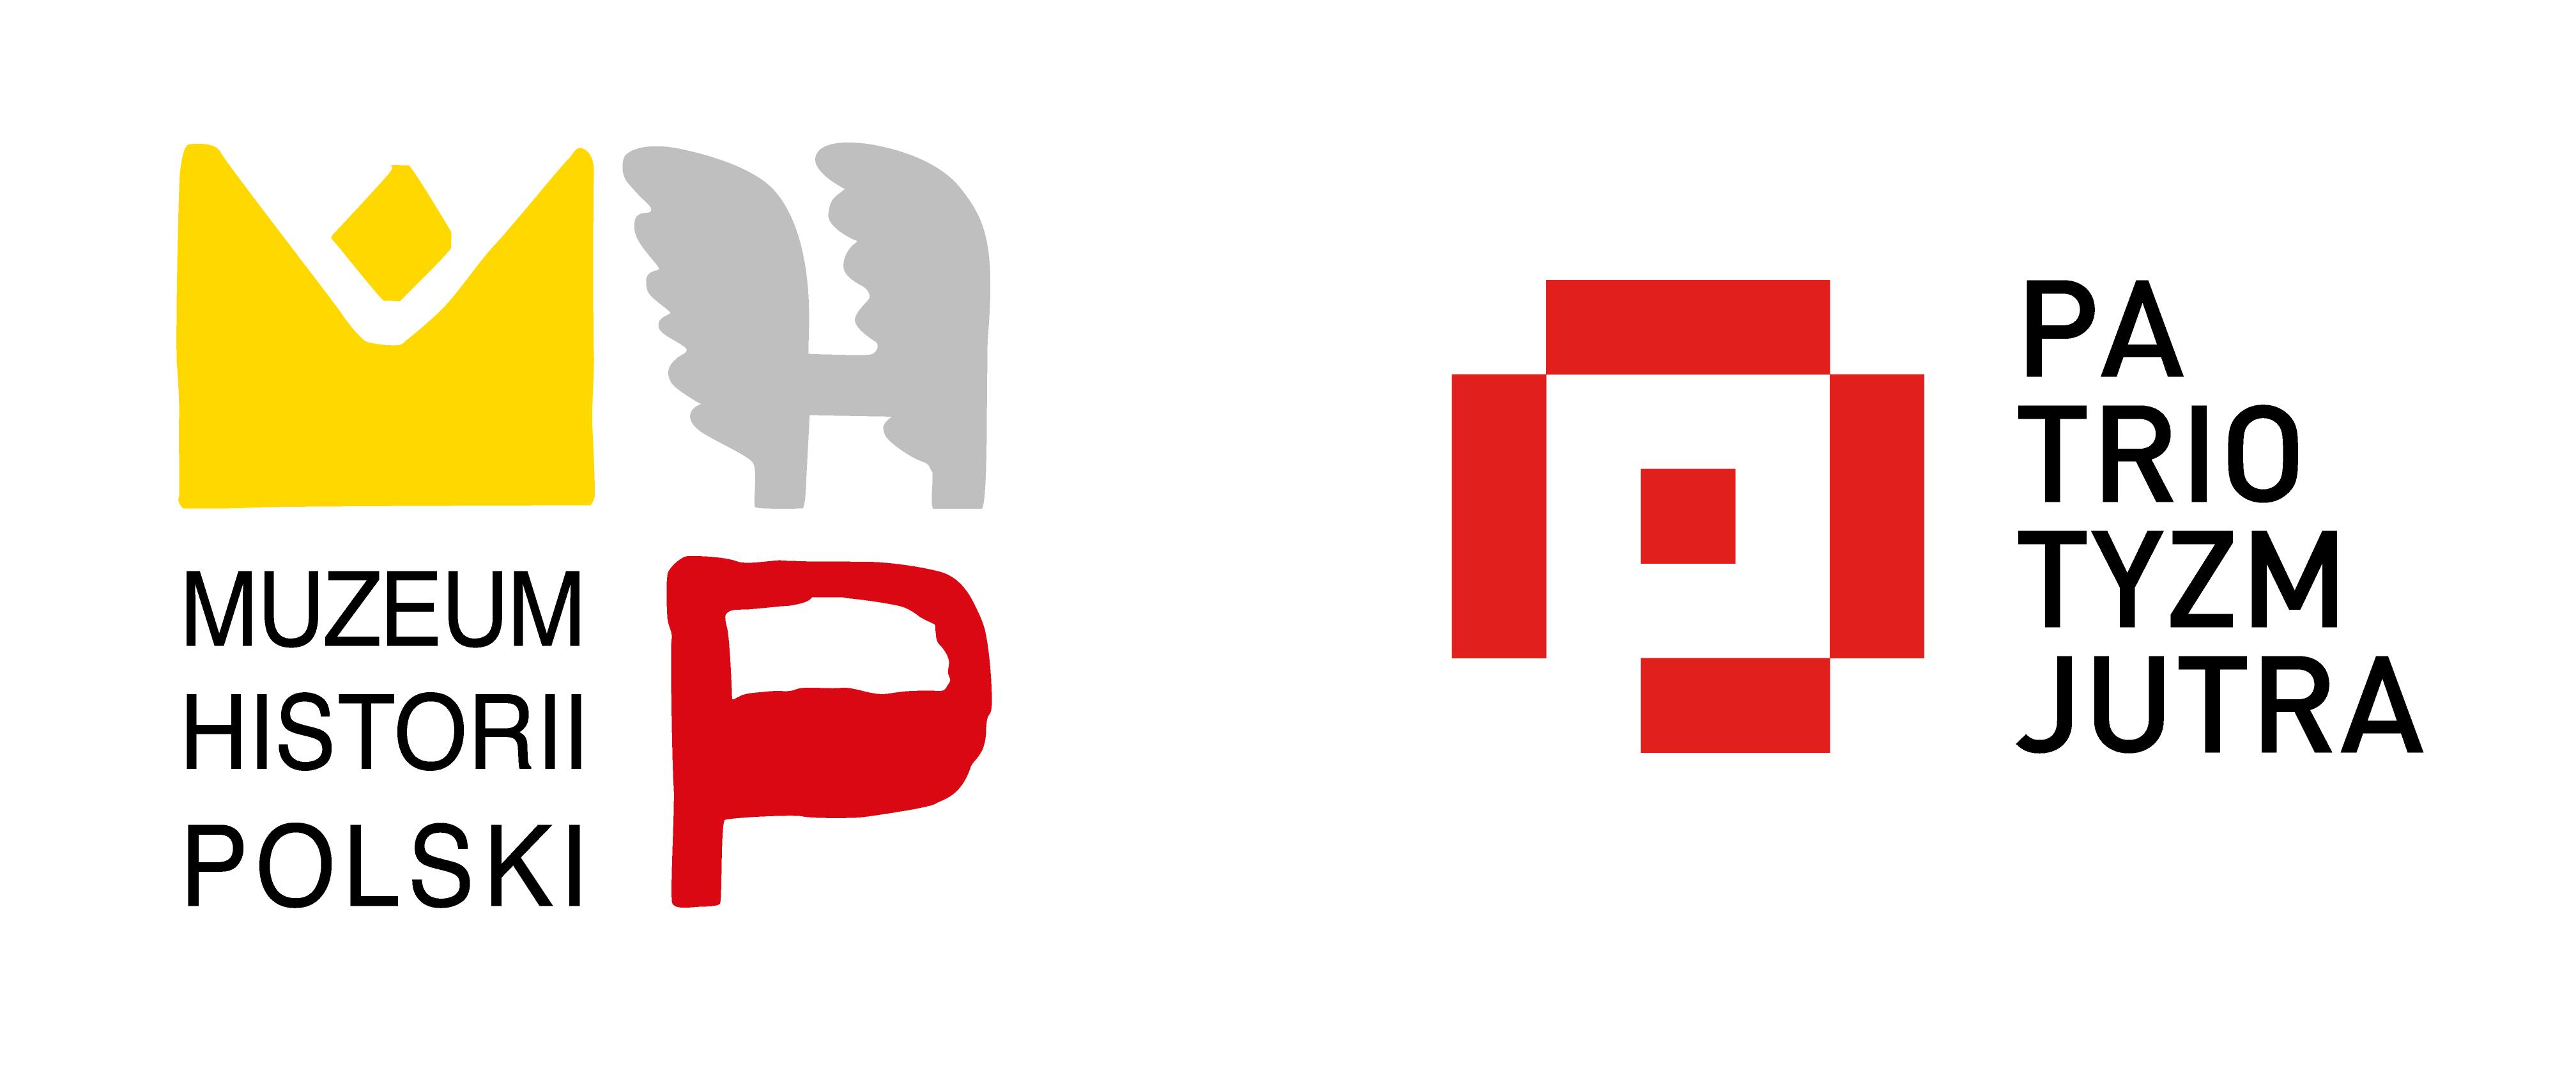 patriotyzm jutra logotypy